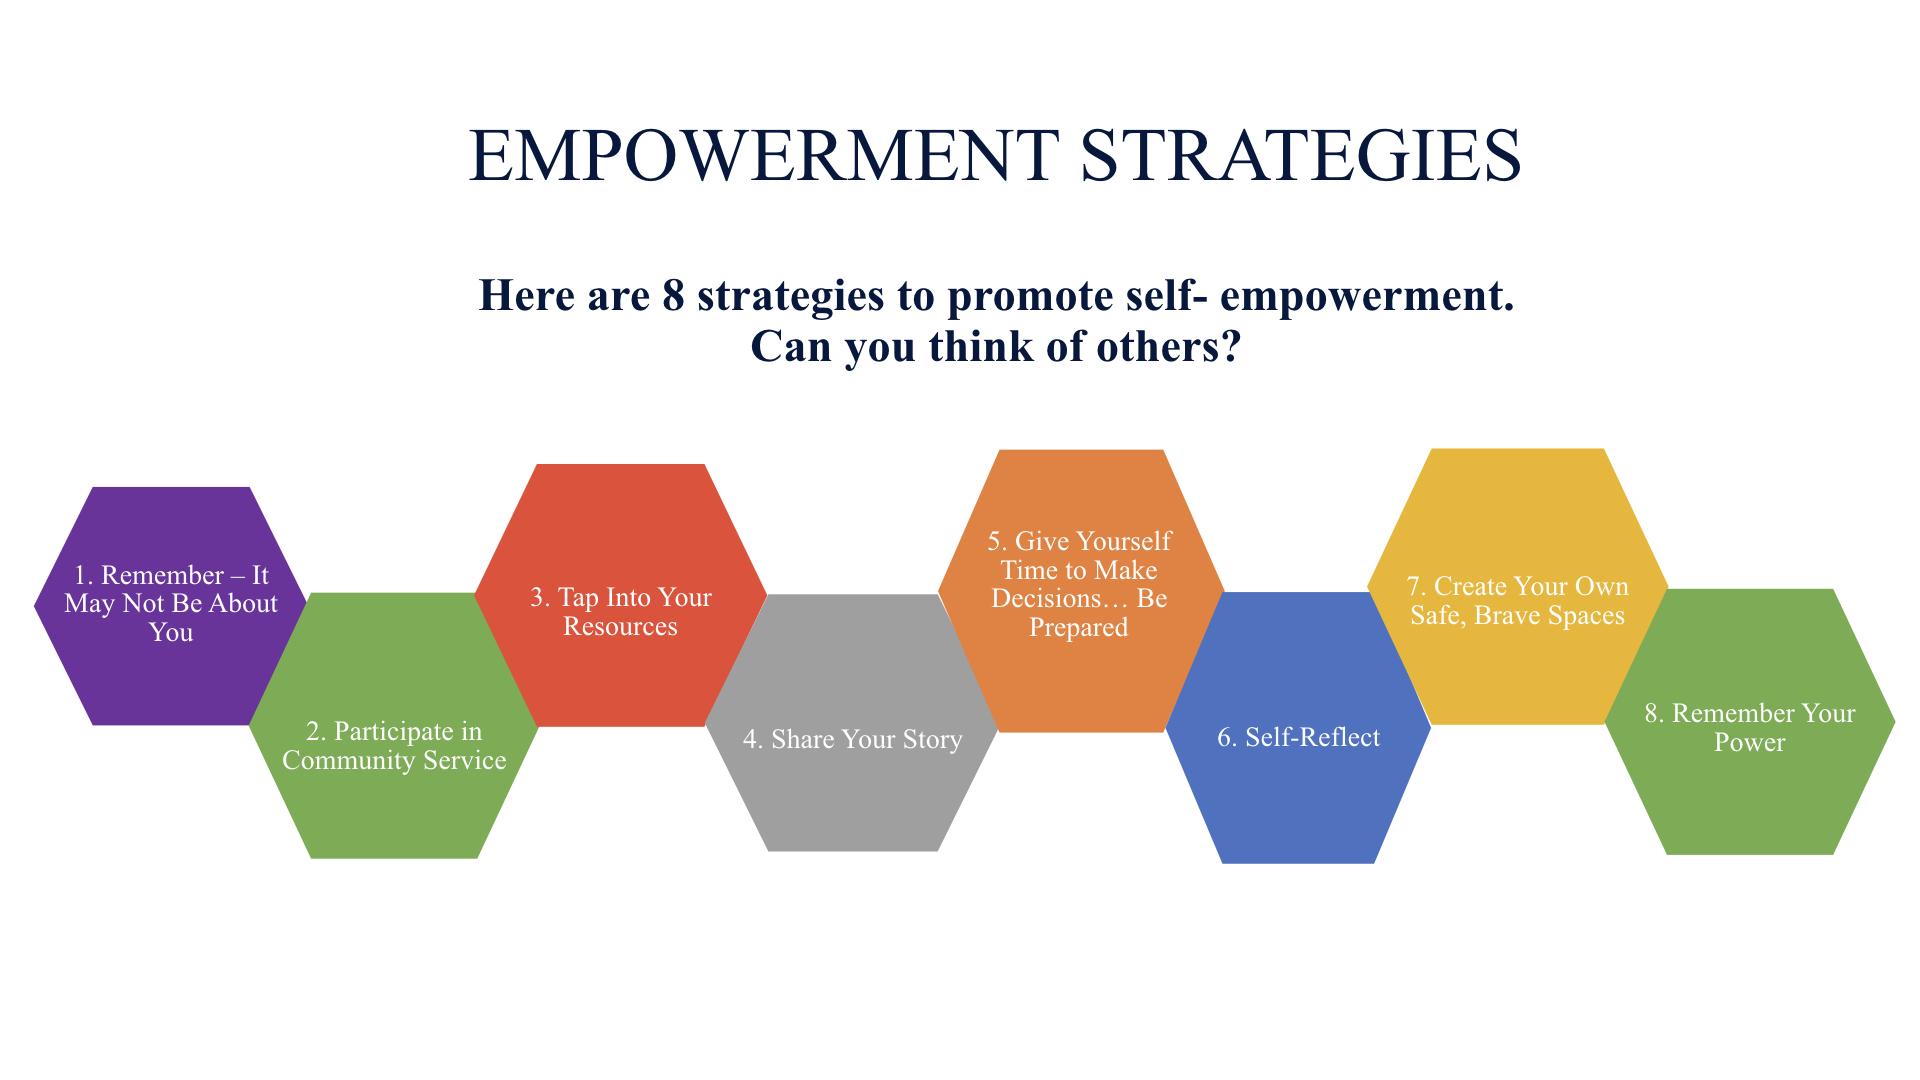 Empowerment Strategies and Verbiage (SLB Nov. 2018).001.jpeg